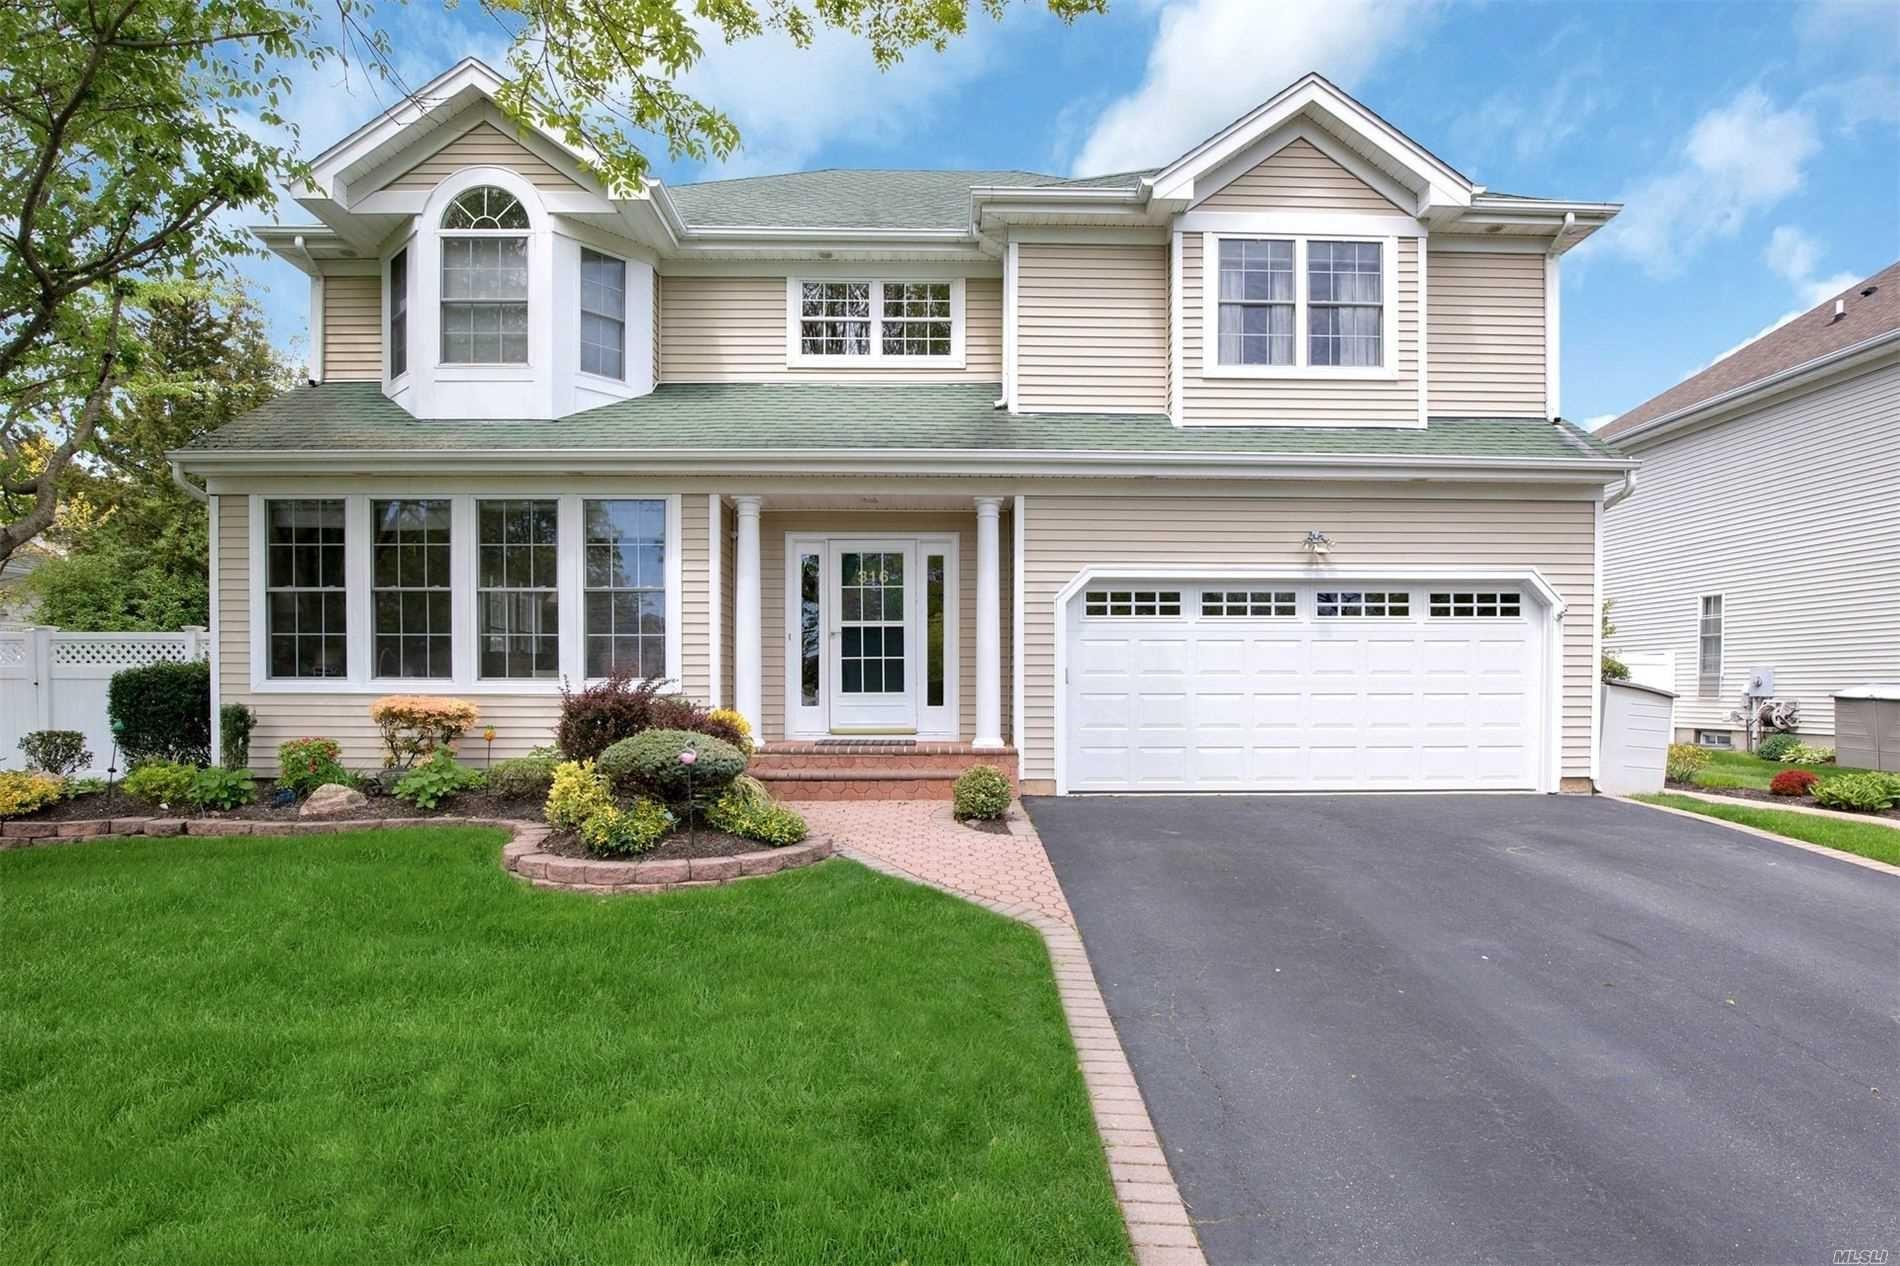 316 Carnation Drive, Farmingdale, NY 11735 - MLS#: 3214284